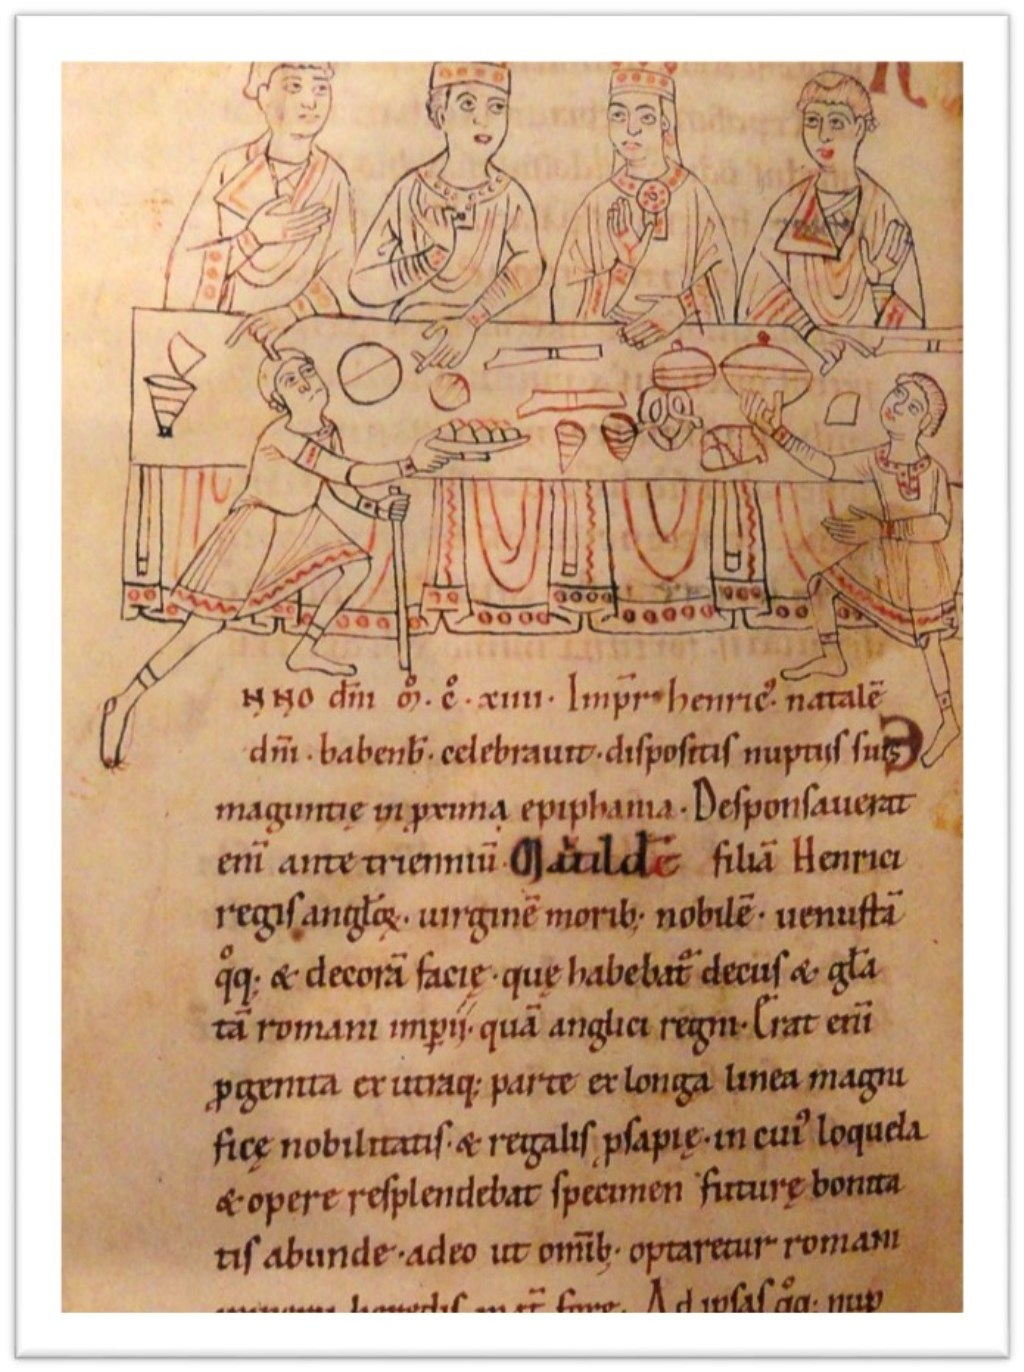 Afbeelding van koningin Mathilde, 12e eeuw. (Parker Library, Corpus Christi College, Cambridge.)